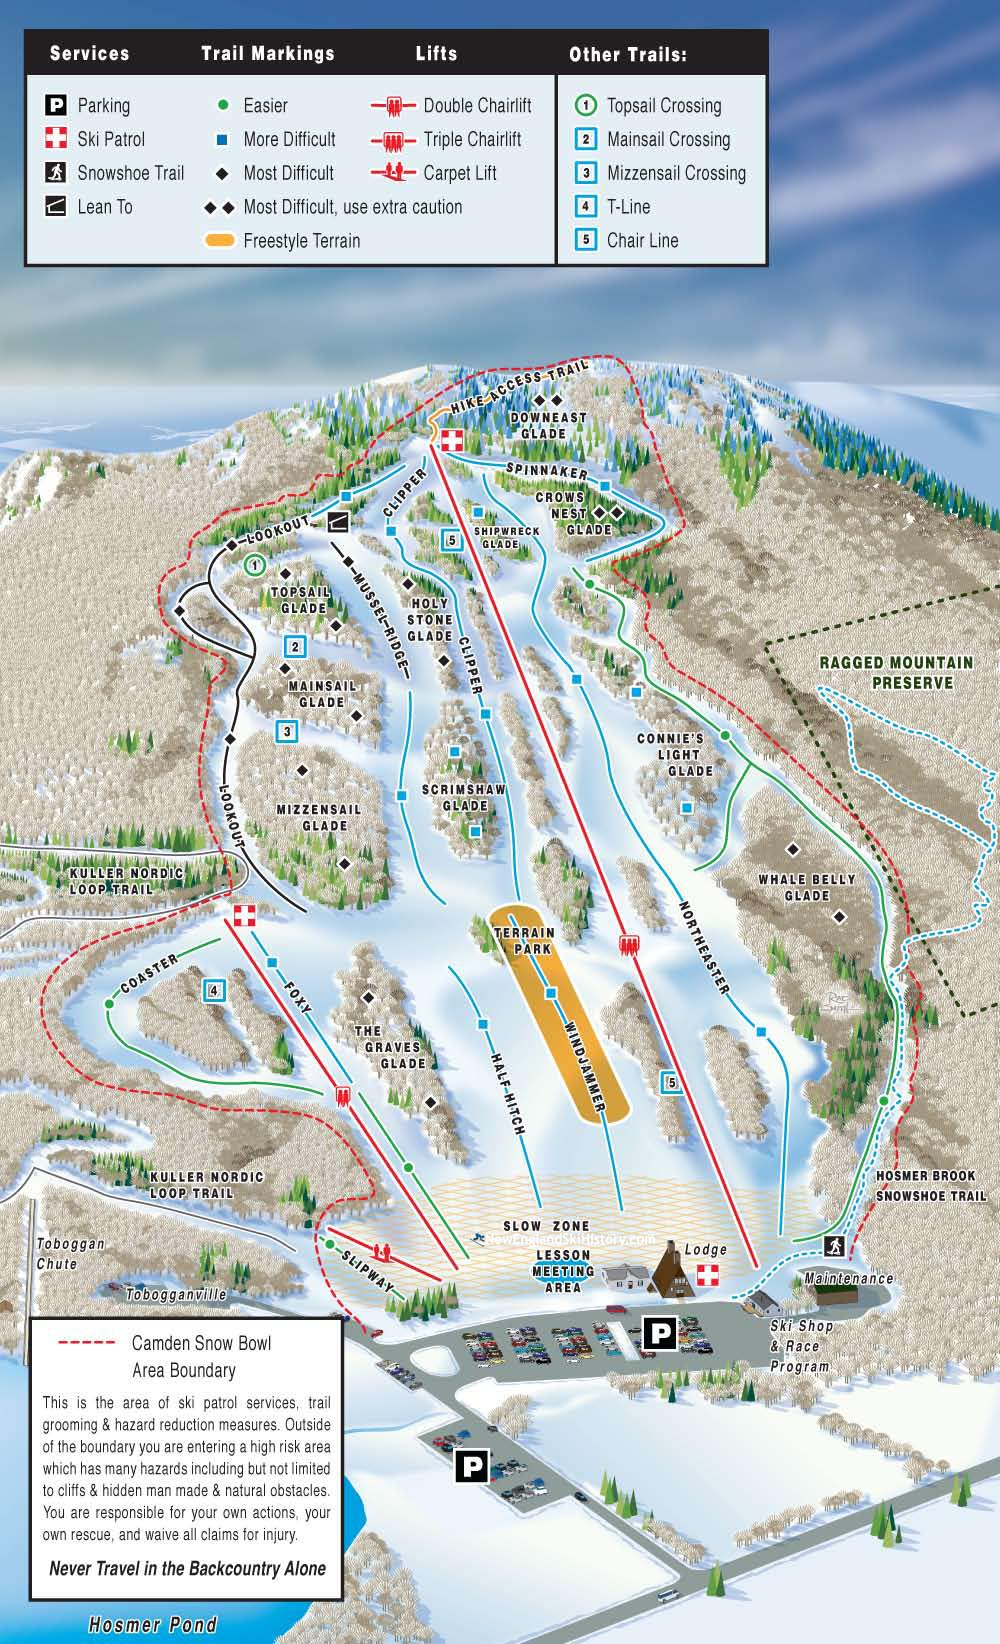 2018-19 Camden Snow Bowl Trail Map